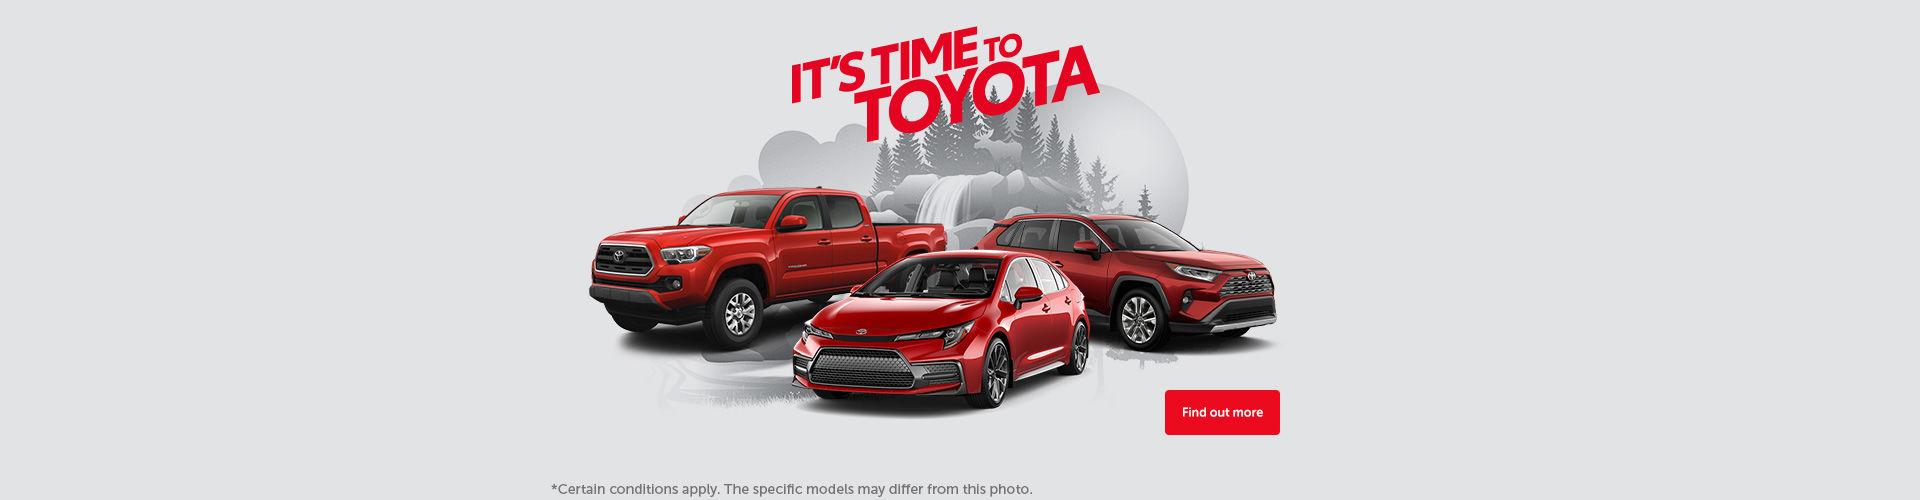 Event Toyota